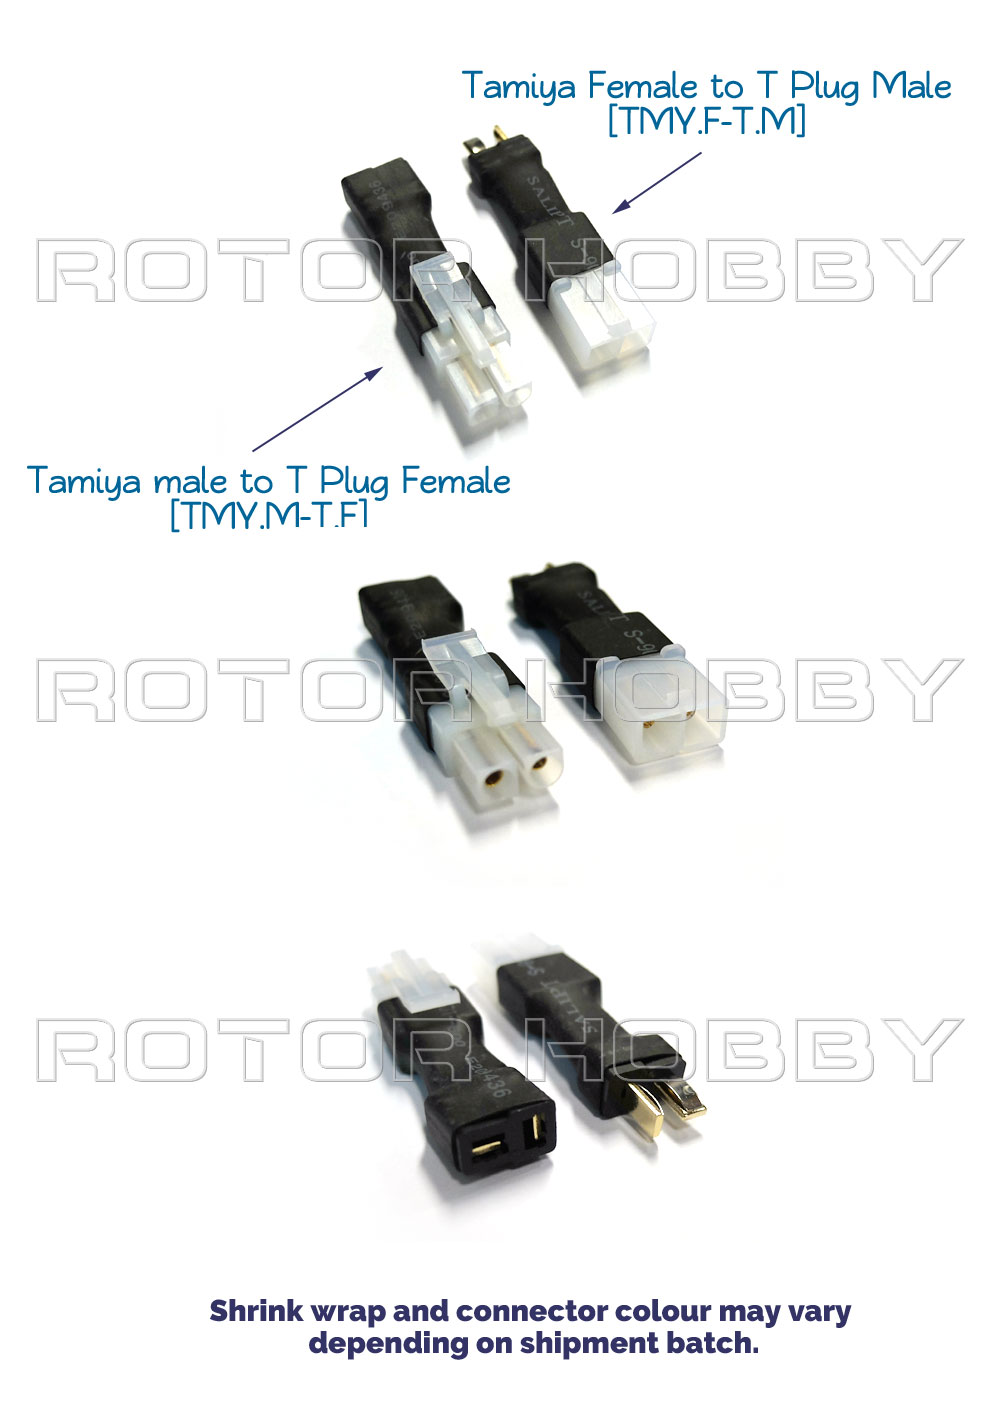 Tamiya Connector to T Plug